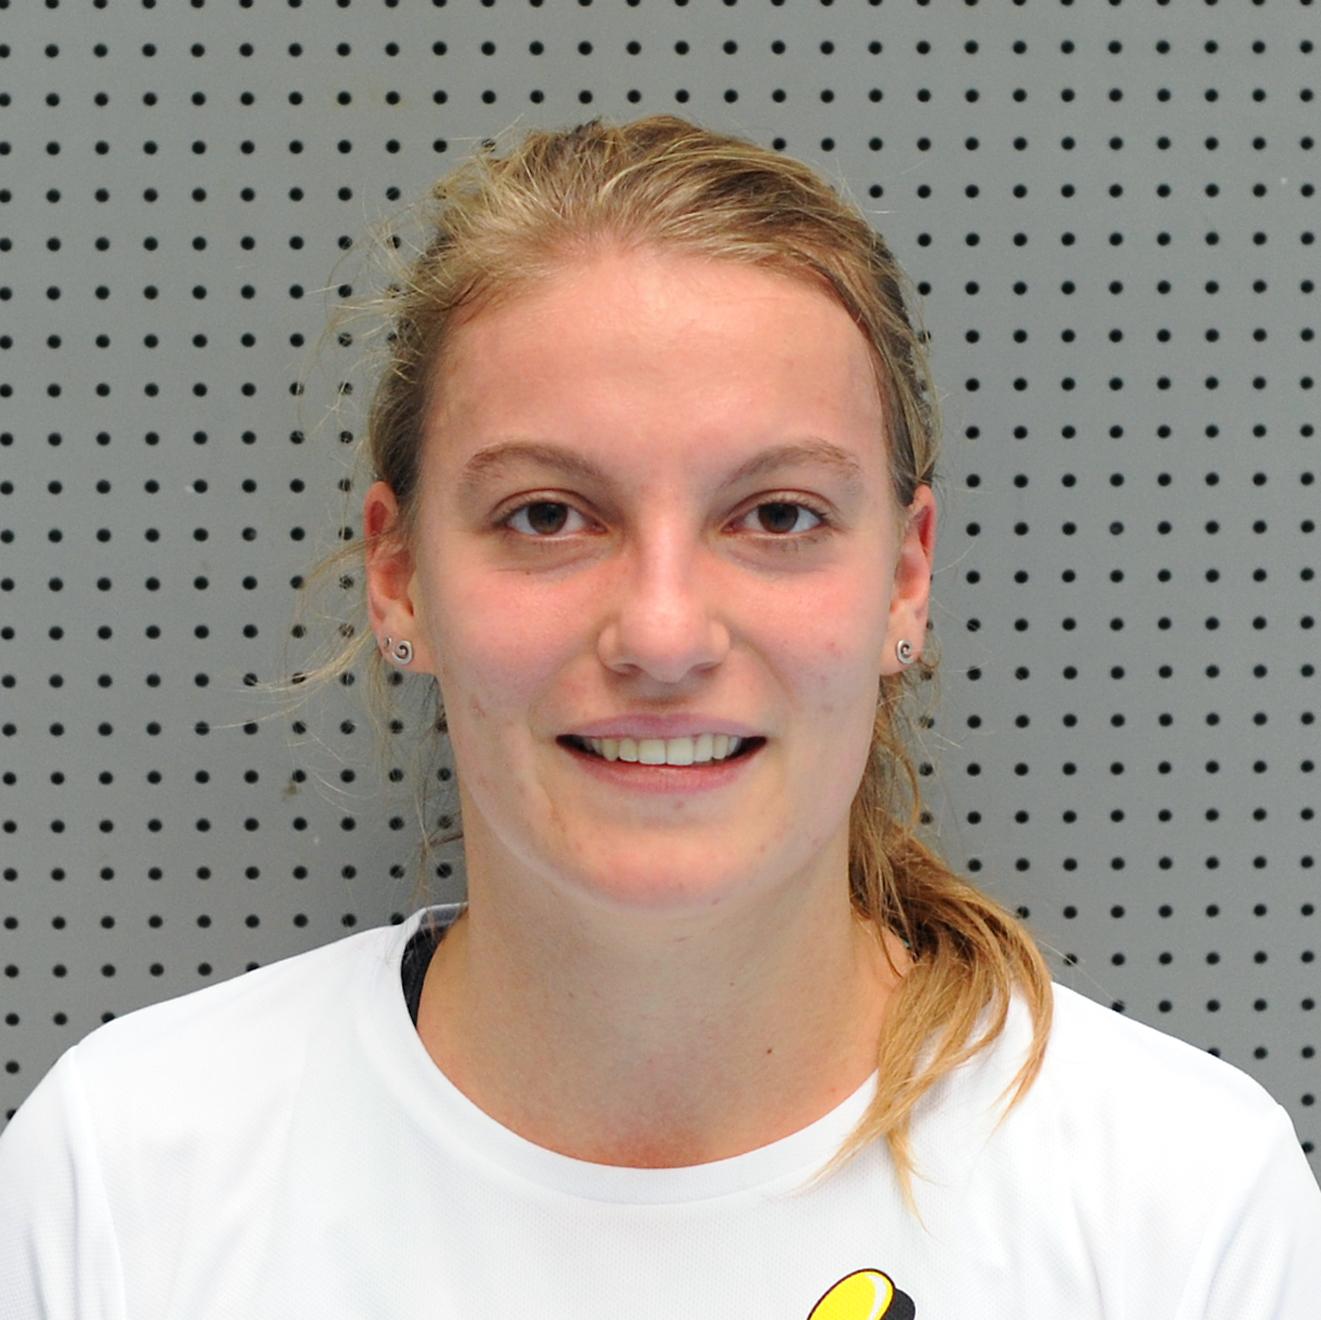 Eliane Keller